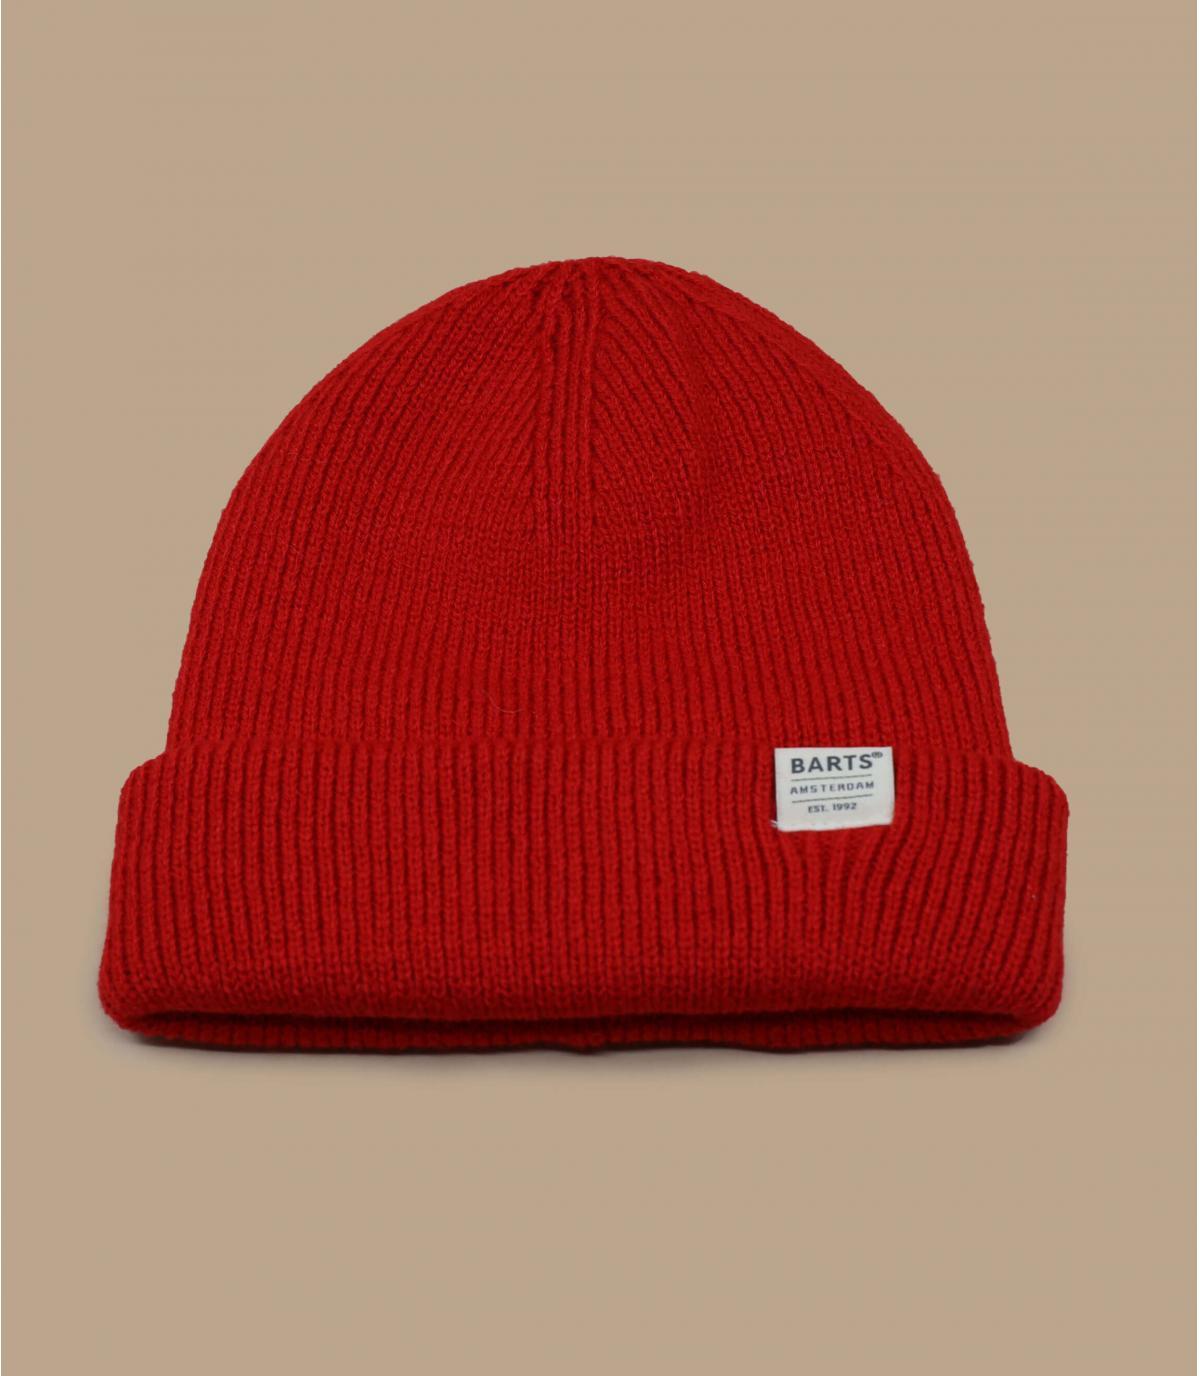 Barts rode docker hoed